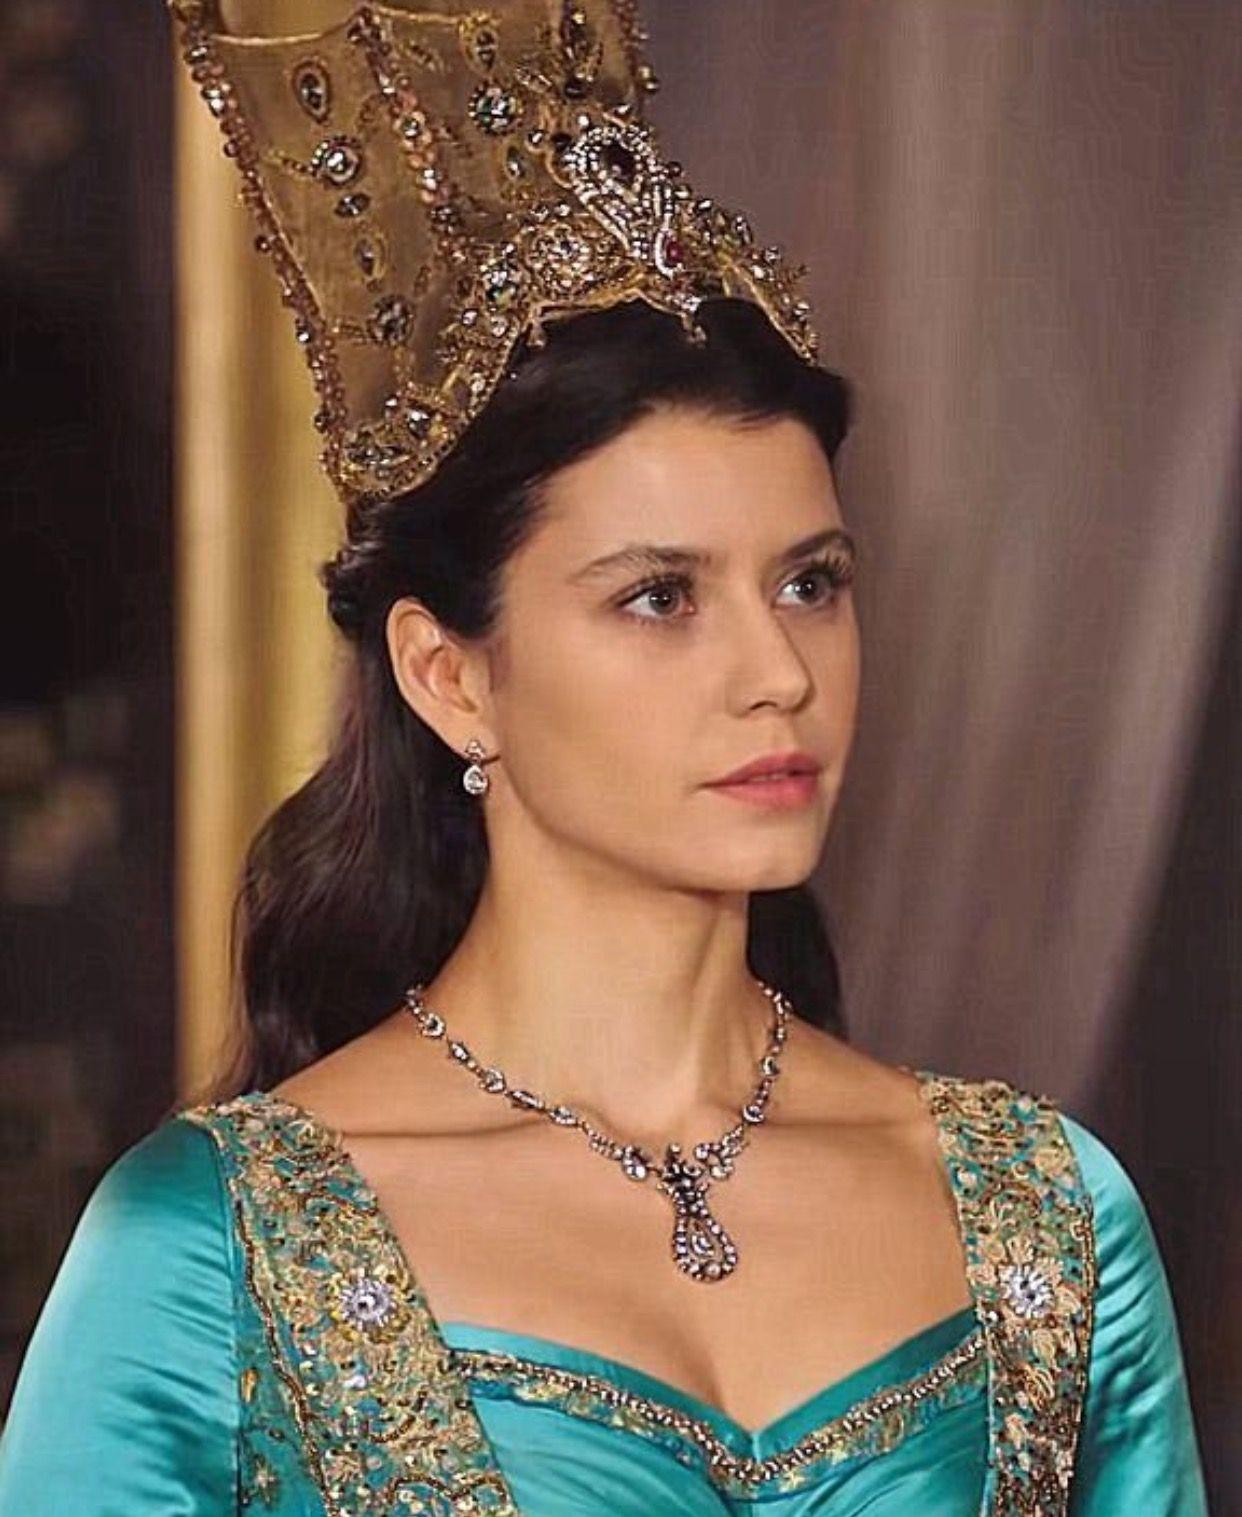 Pin by Fereba Hafizi on Headwear   Fashion, Turkish fashion, Turkish